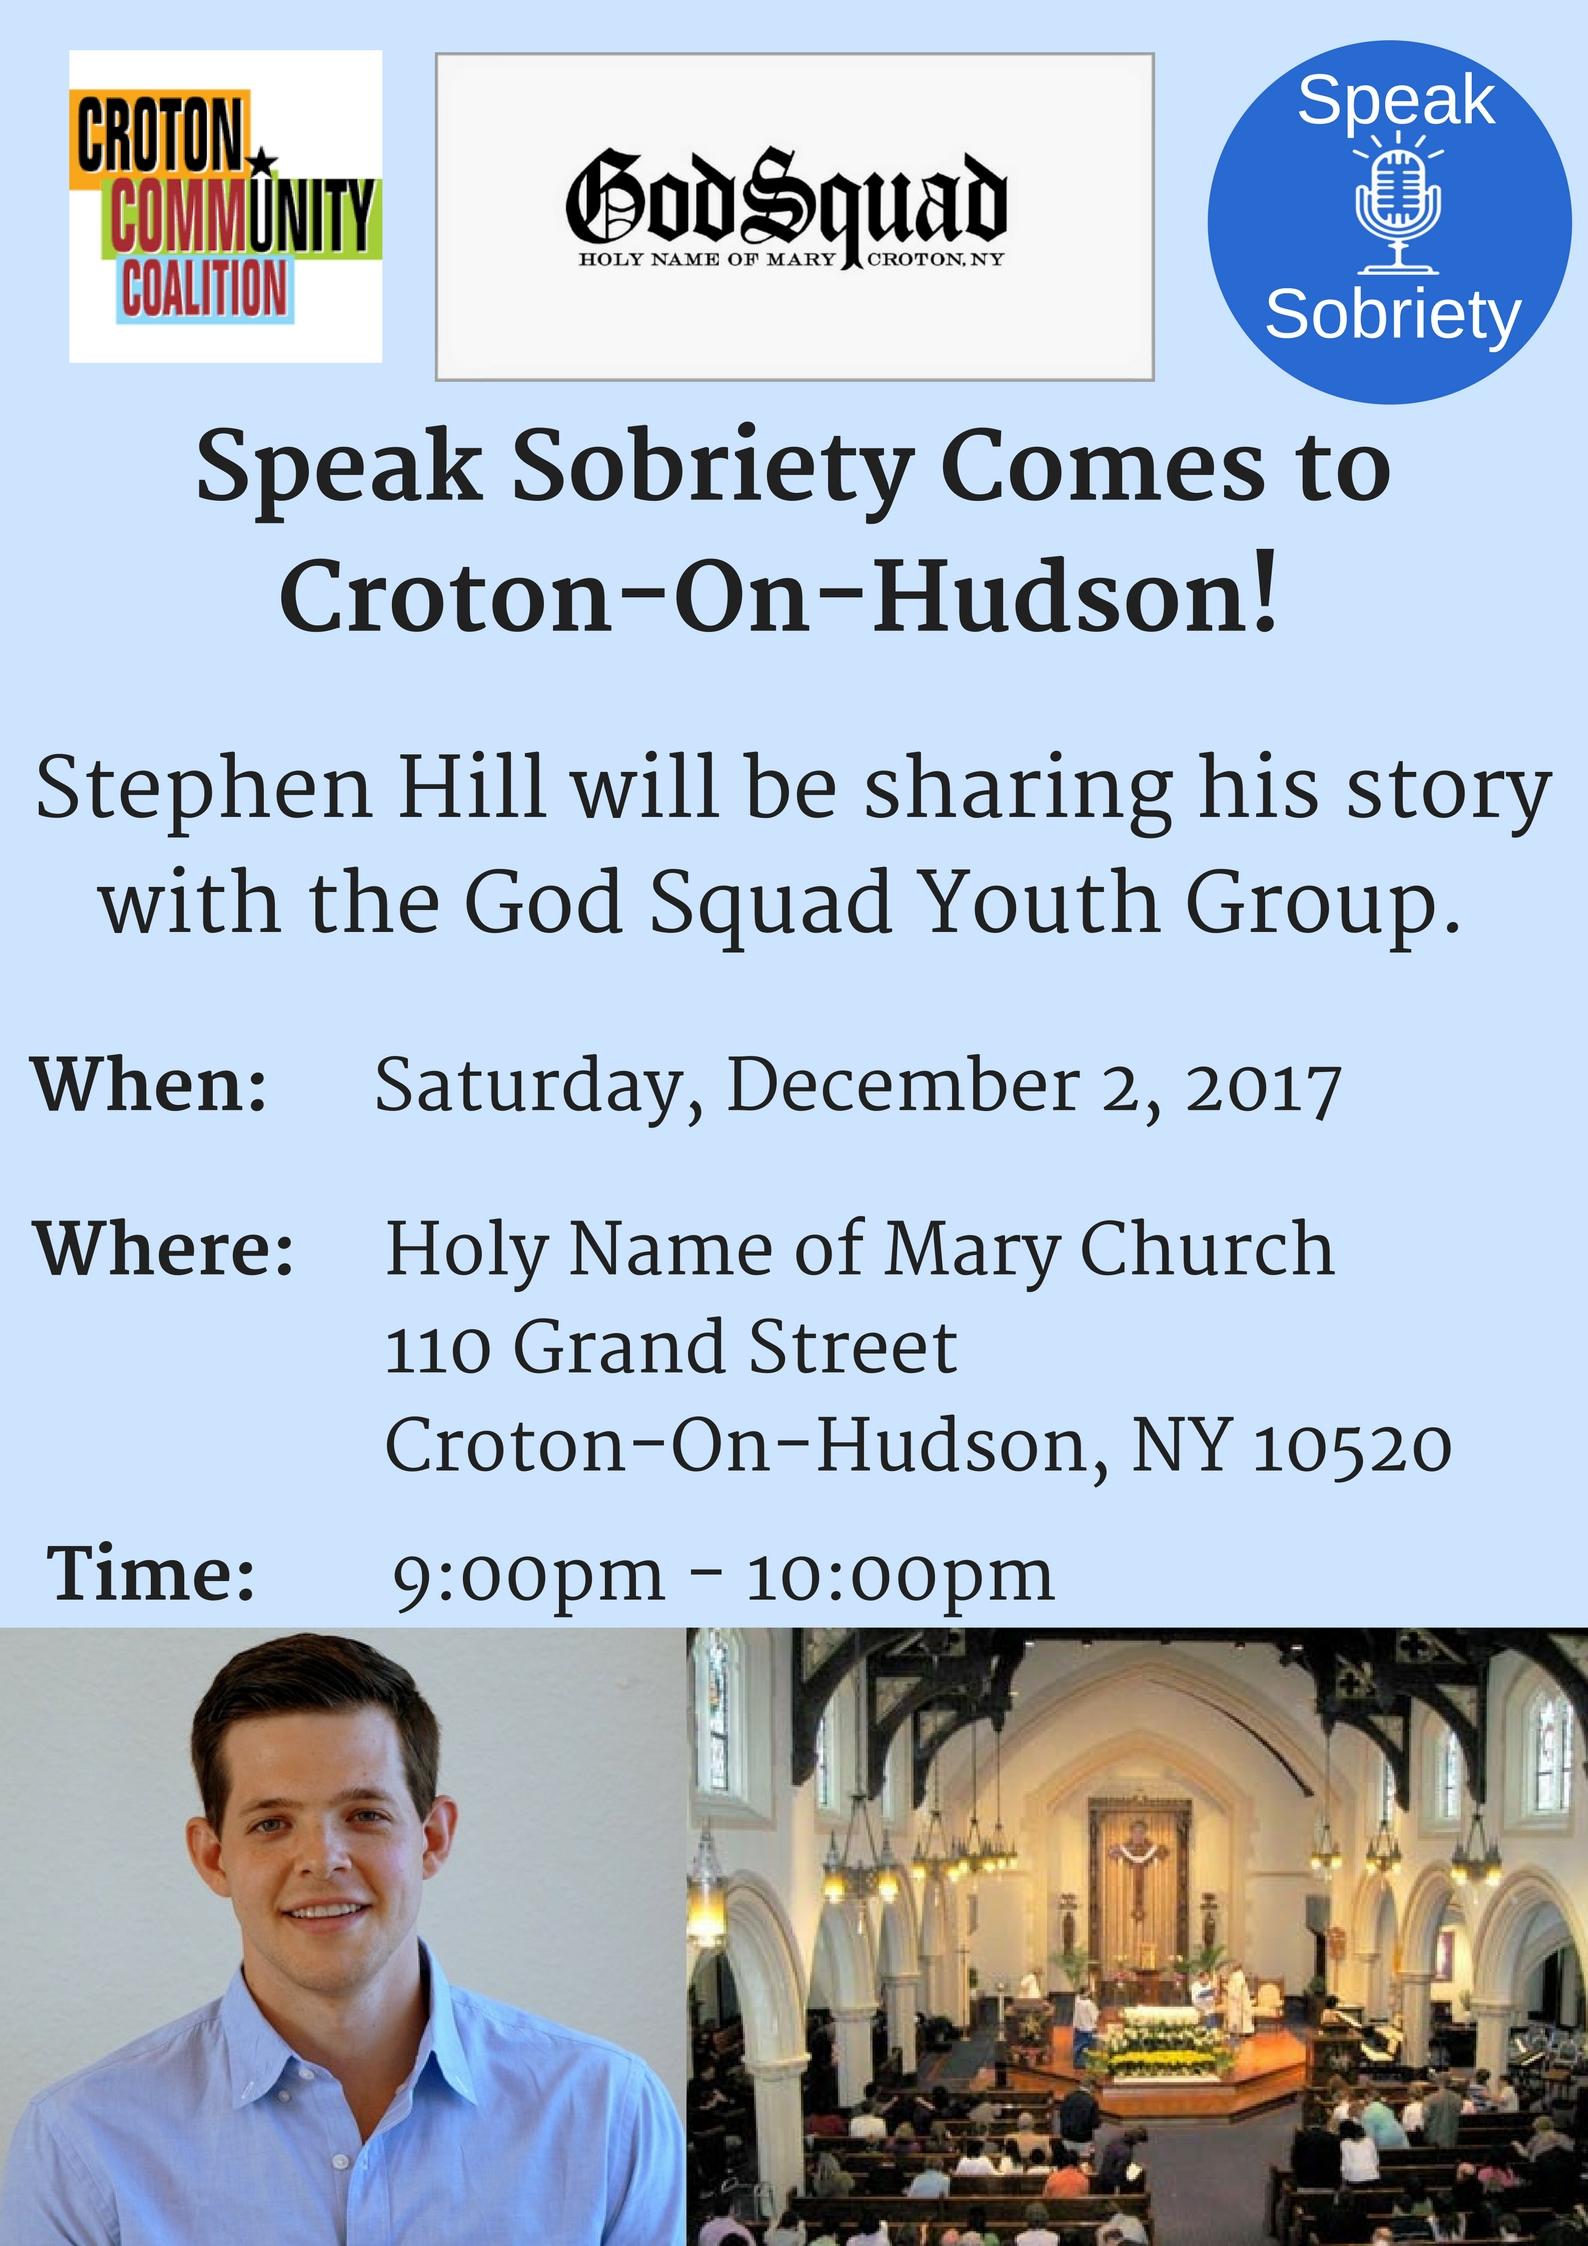 Speak Sobriety Comes to Croton-On-Hudson! (2)